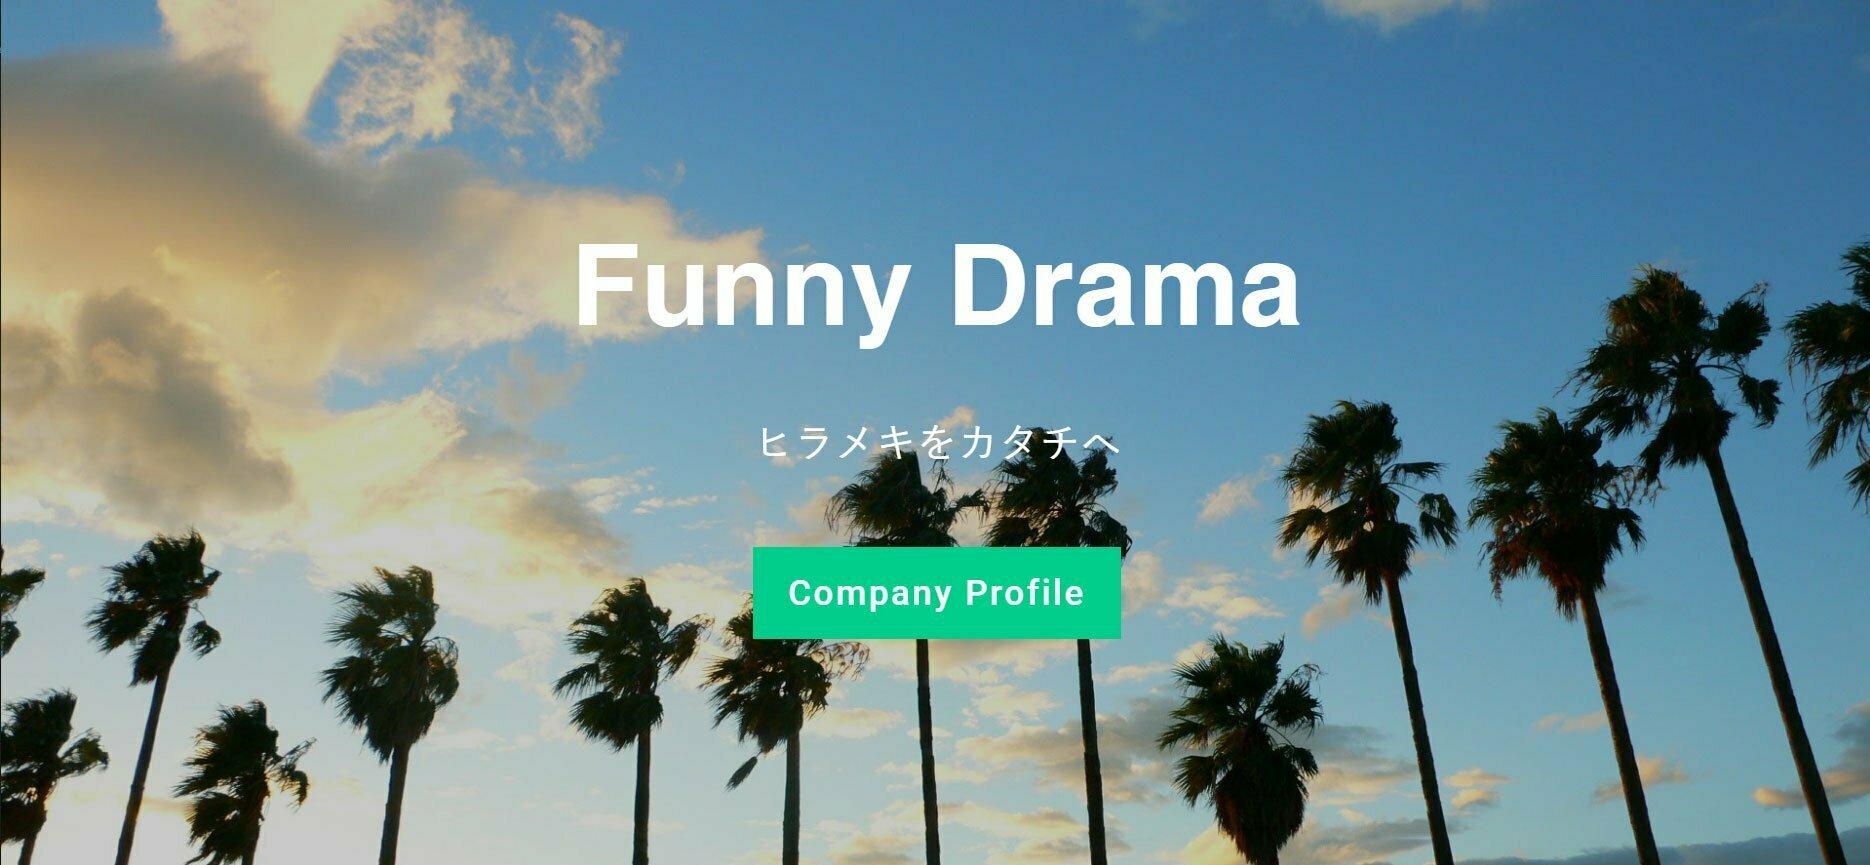 Funny Drama 様